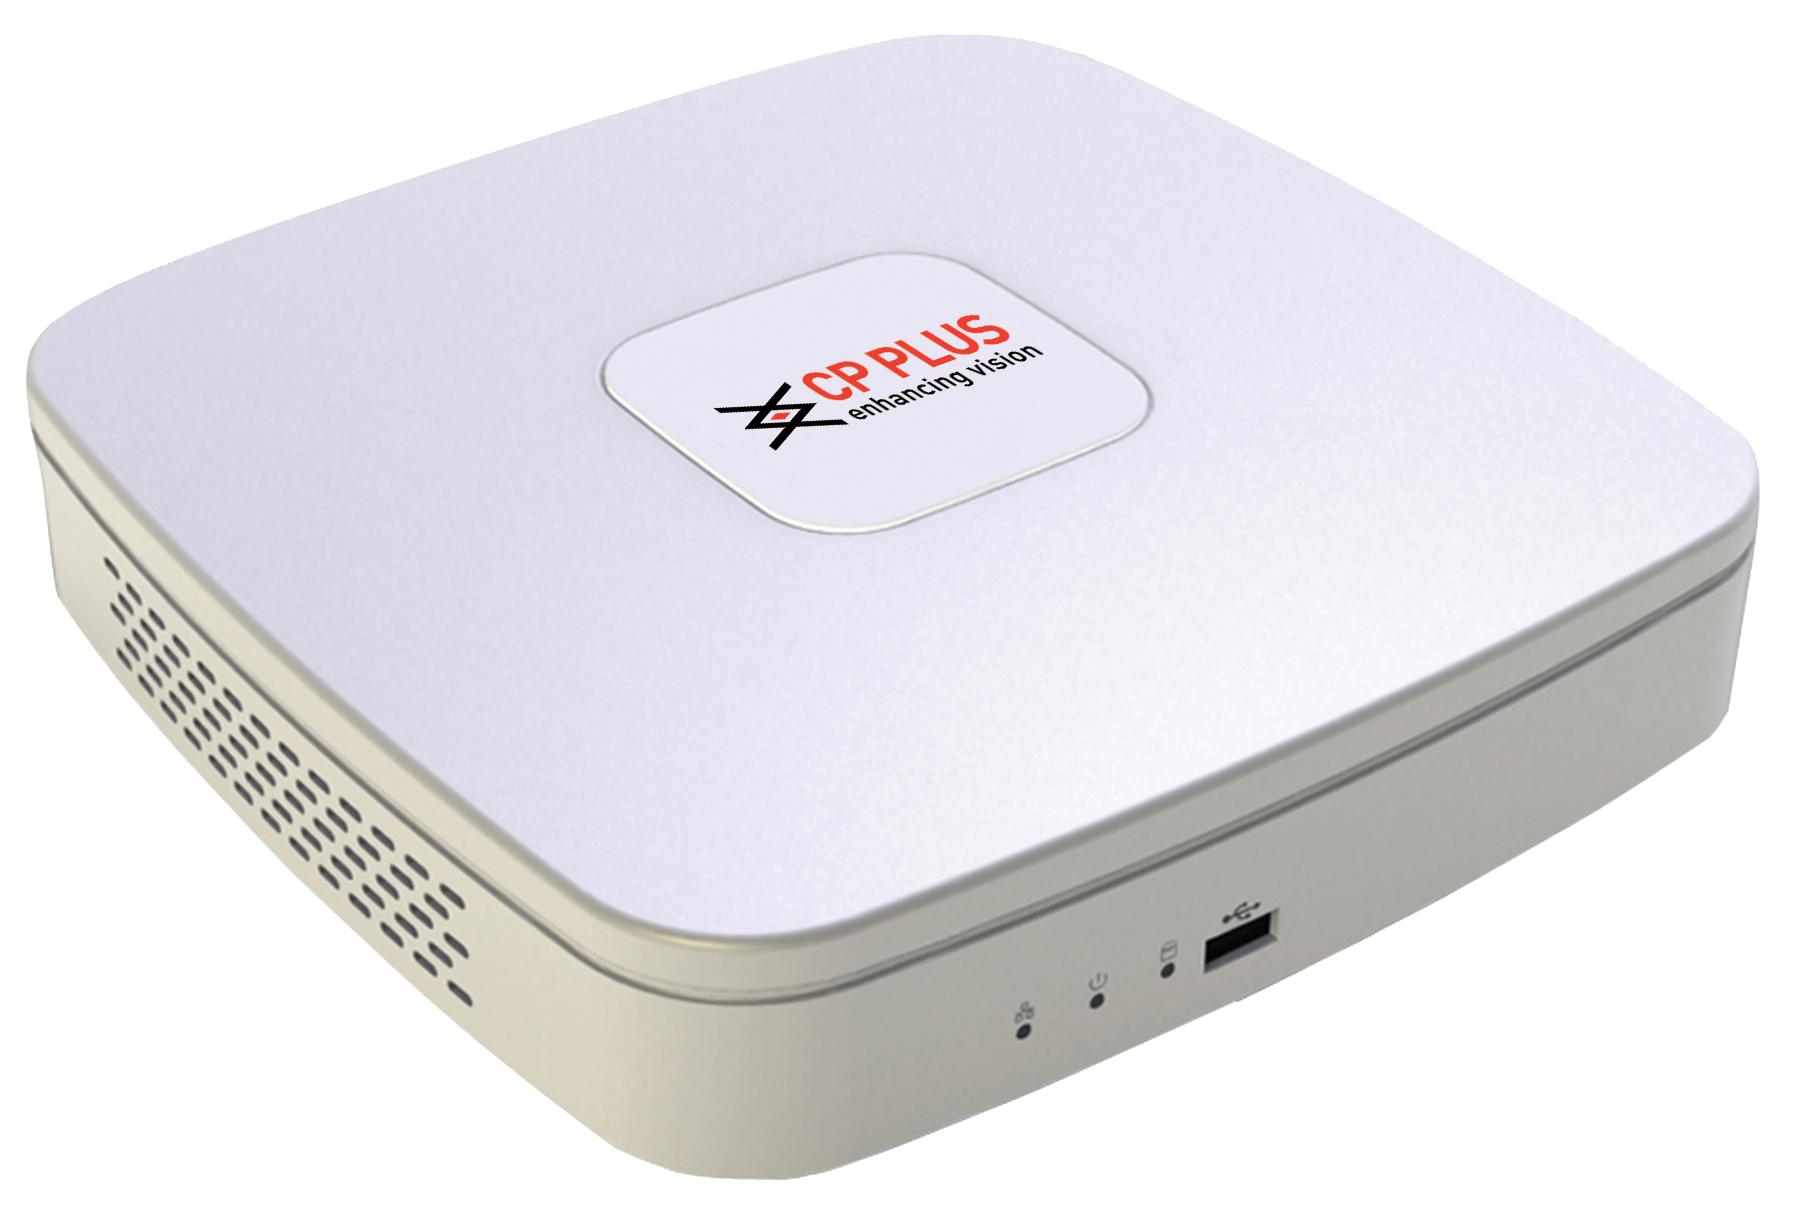 CP-UAR-0800P1 Digitální videorekordér s kompresí H.264 - kamerové systémy CP PLUS